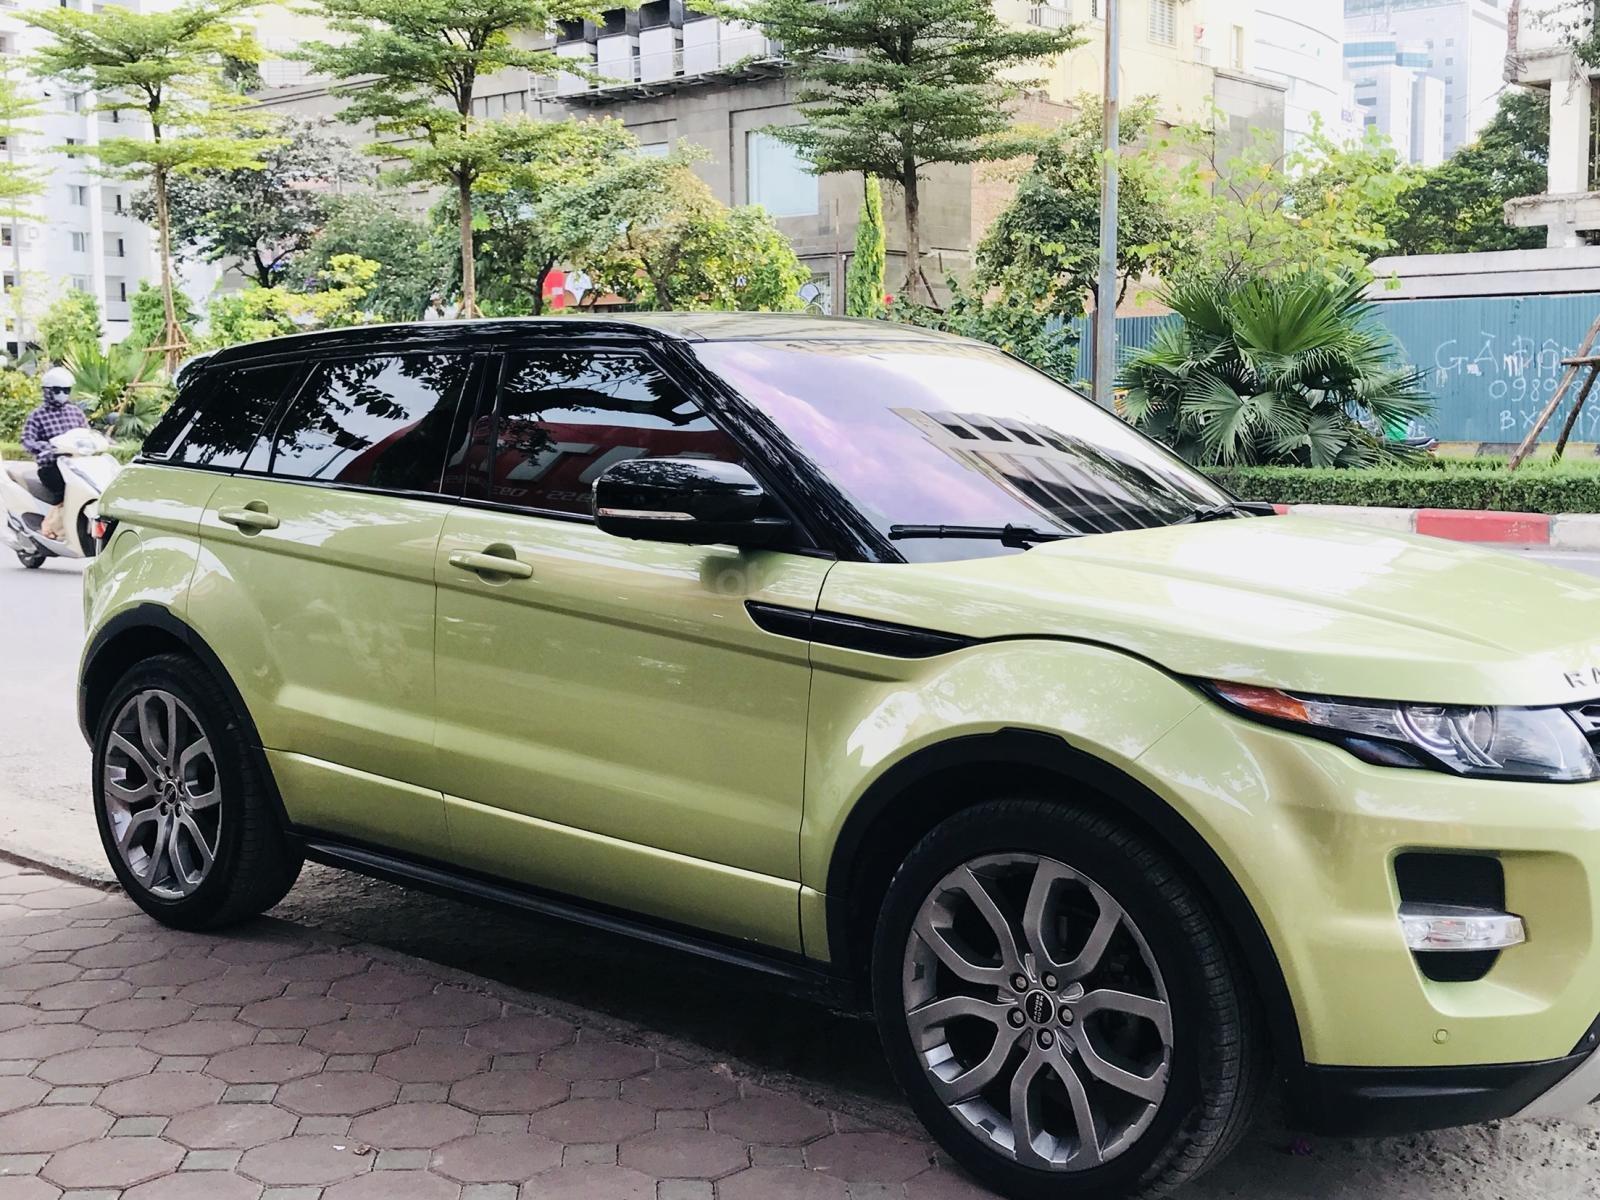 Cần bán xe LandRover Evoque sản xuất 2012 màu xanh (2)